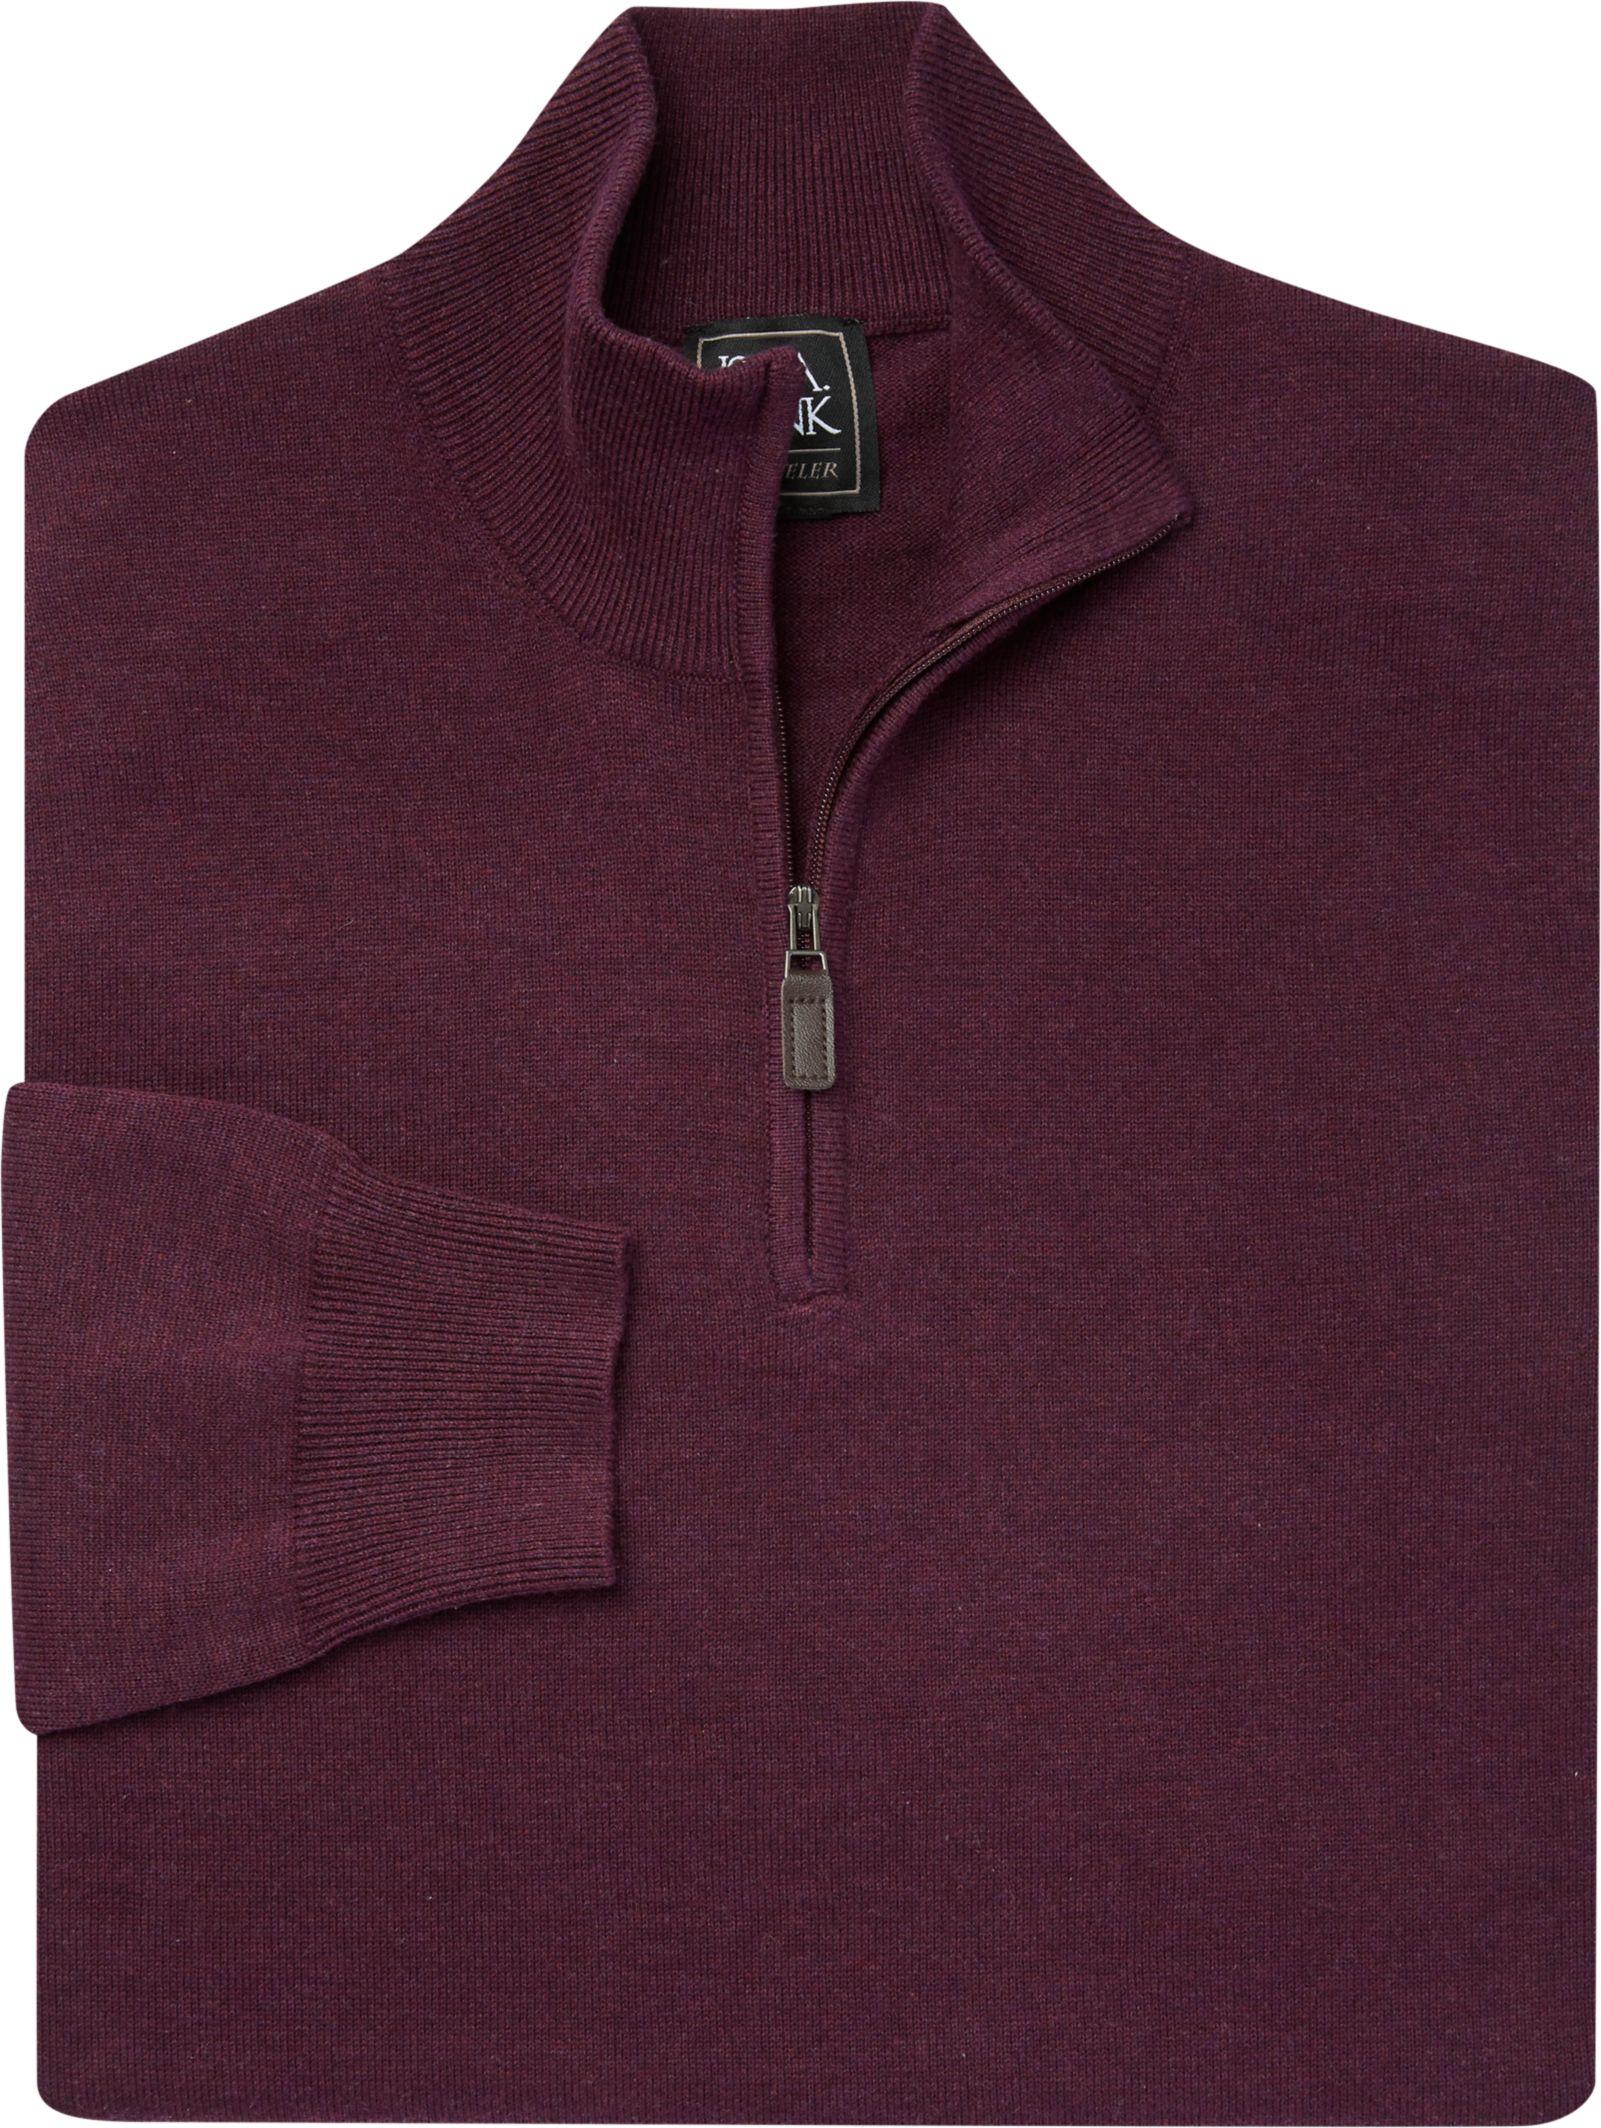 Traveler Collection Mock Neck Cotton Quarter-Zip Sweater (various colors)